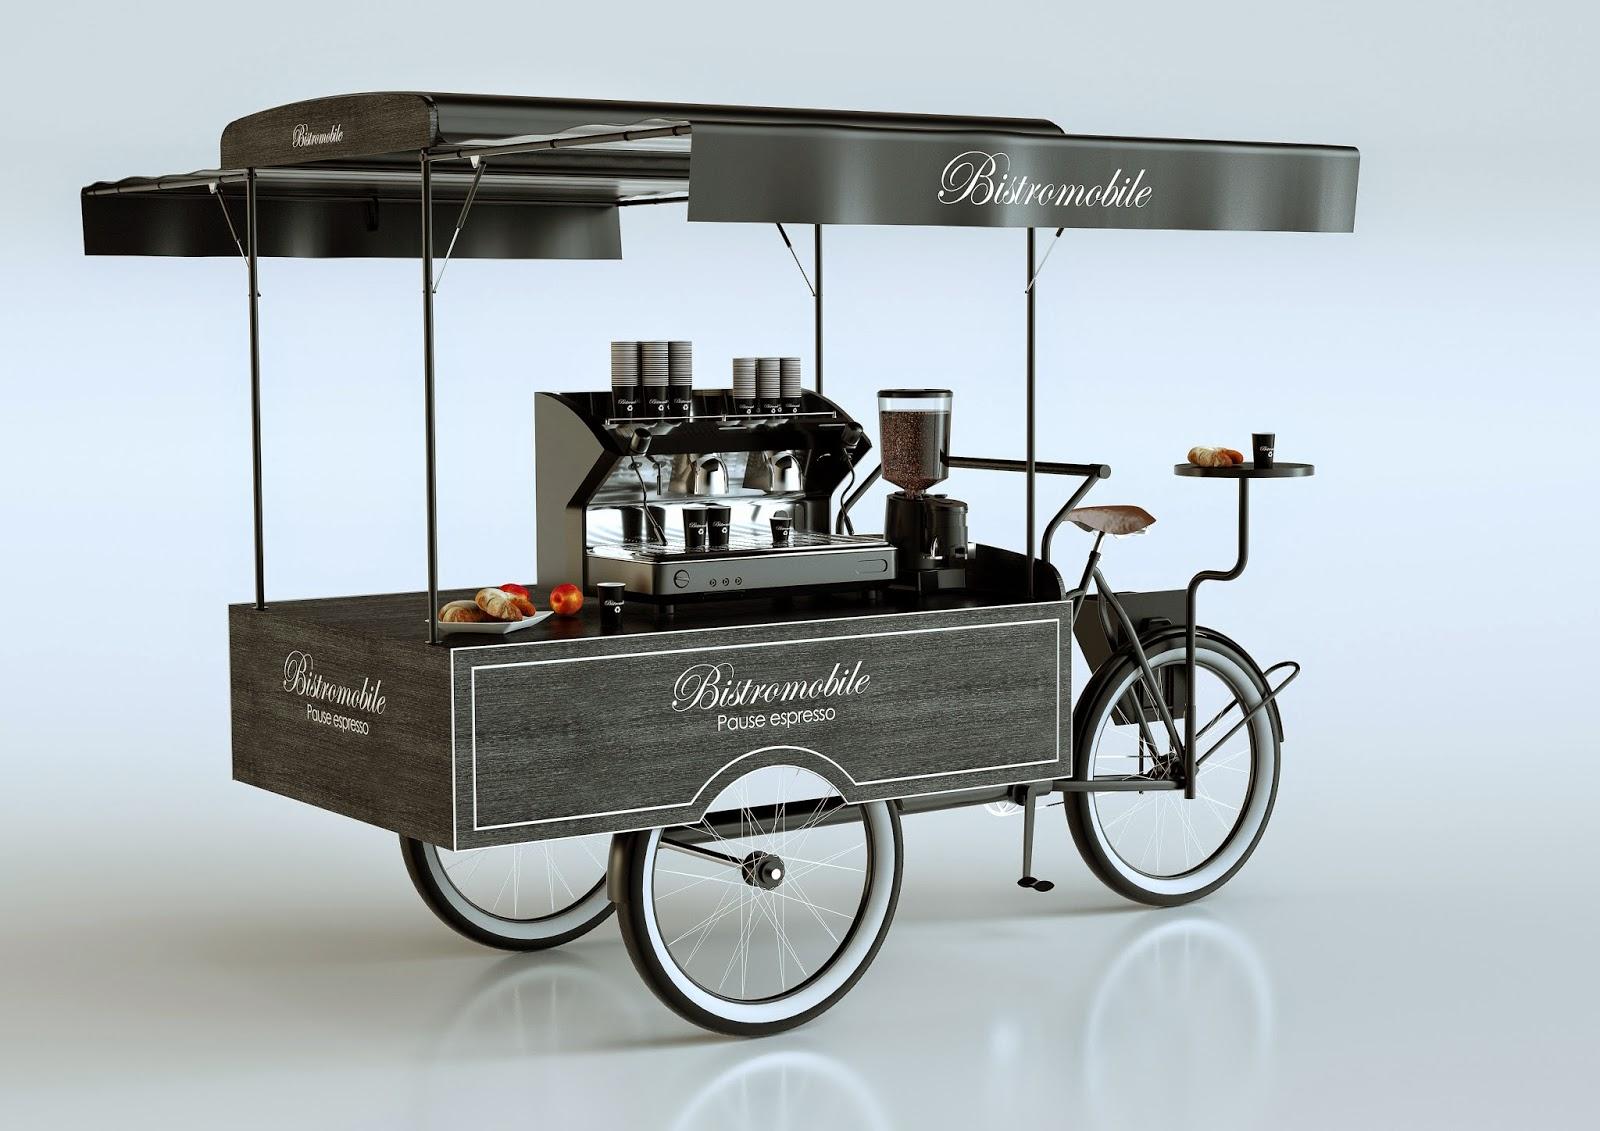 barista kaffeefahrrad coffeebike mieten messe event k ln bonn d sseldorf essen frankfurt. Black Bedroom Furniture Sets. Home Design Ideas